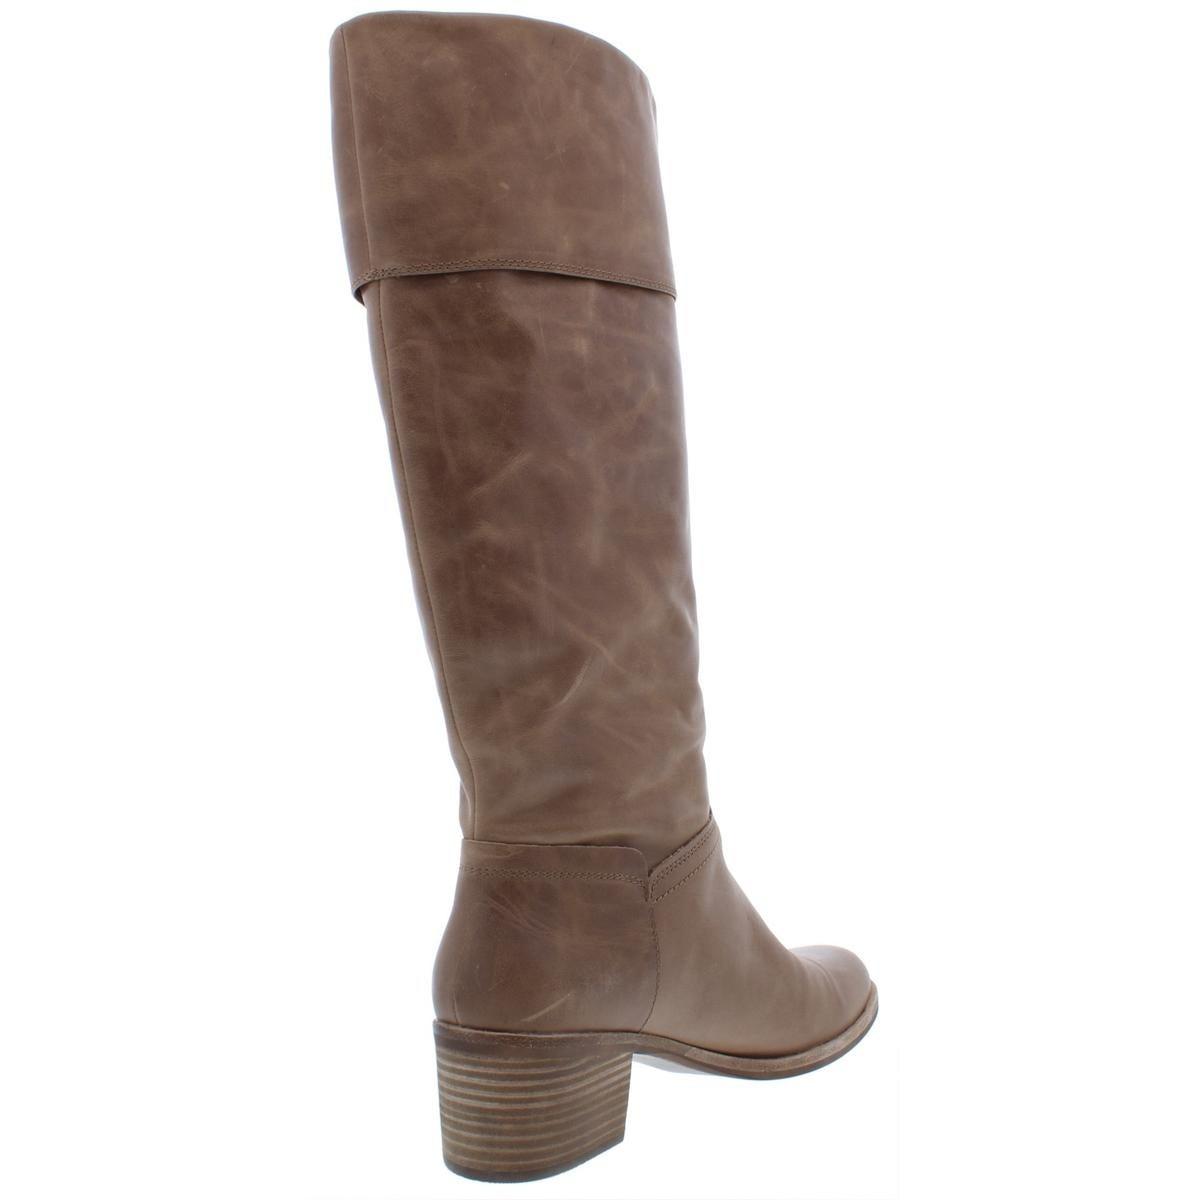 e82ca1d33f4 Shop Ugg Womens Carlin Knee-High Boots Leather Fashion - Free ...